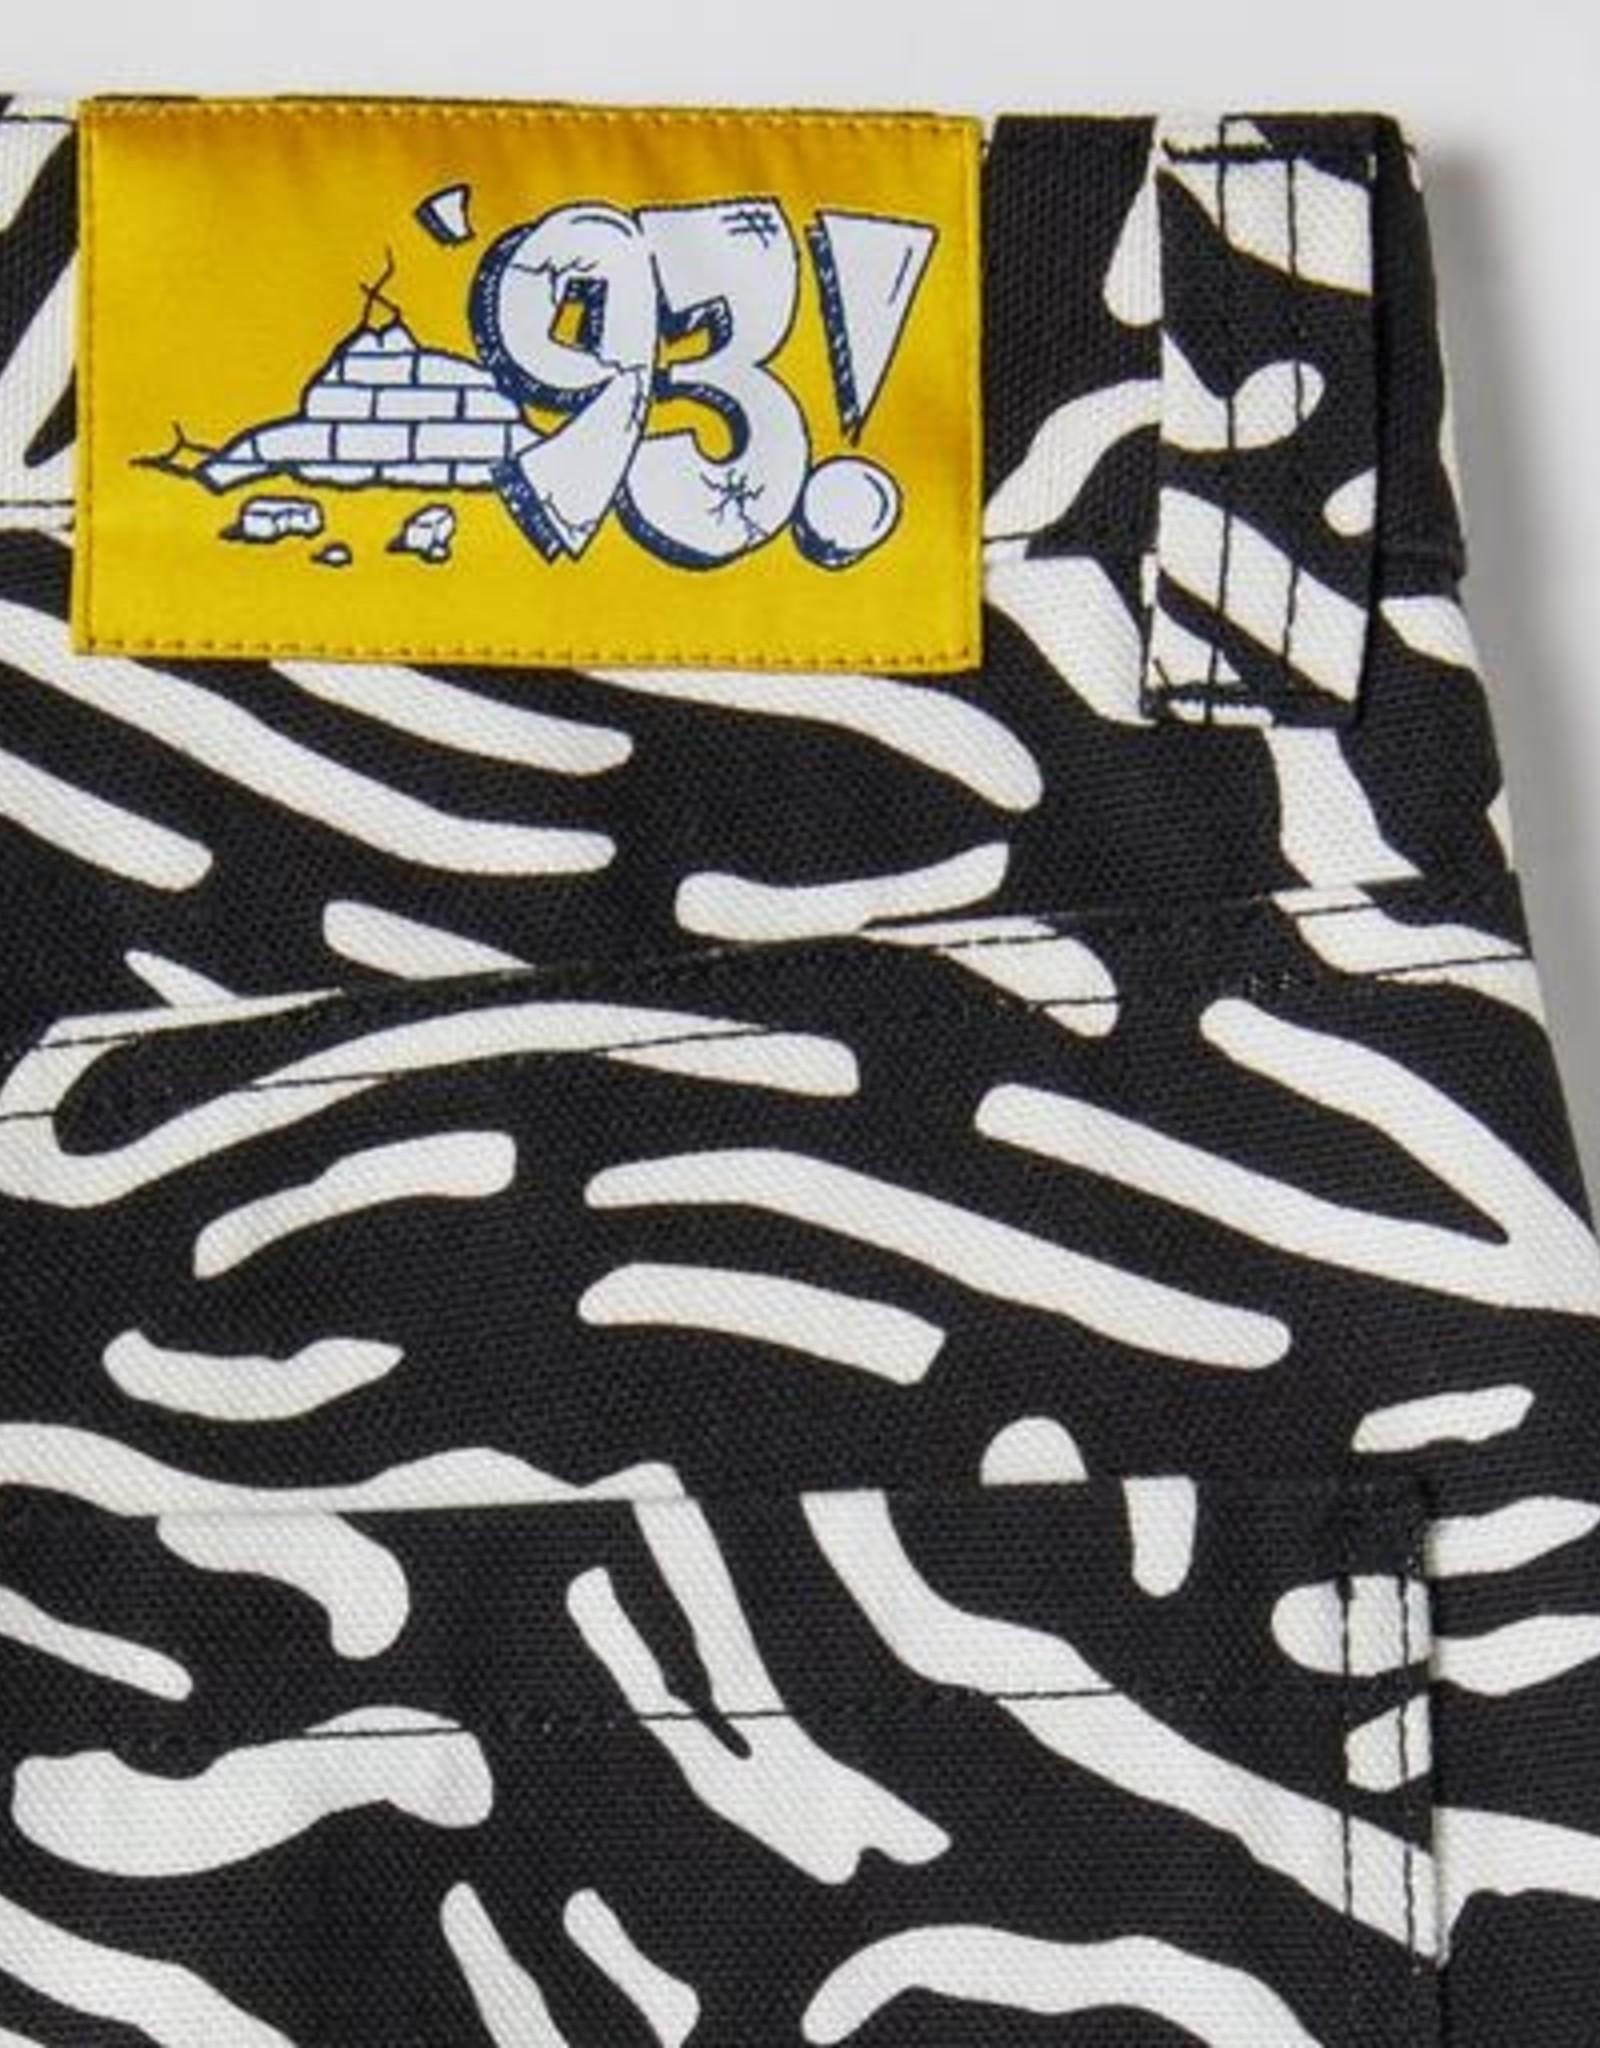 POLAR '93 CANVAS CELL PANT - BLACK